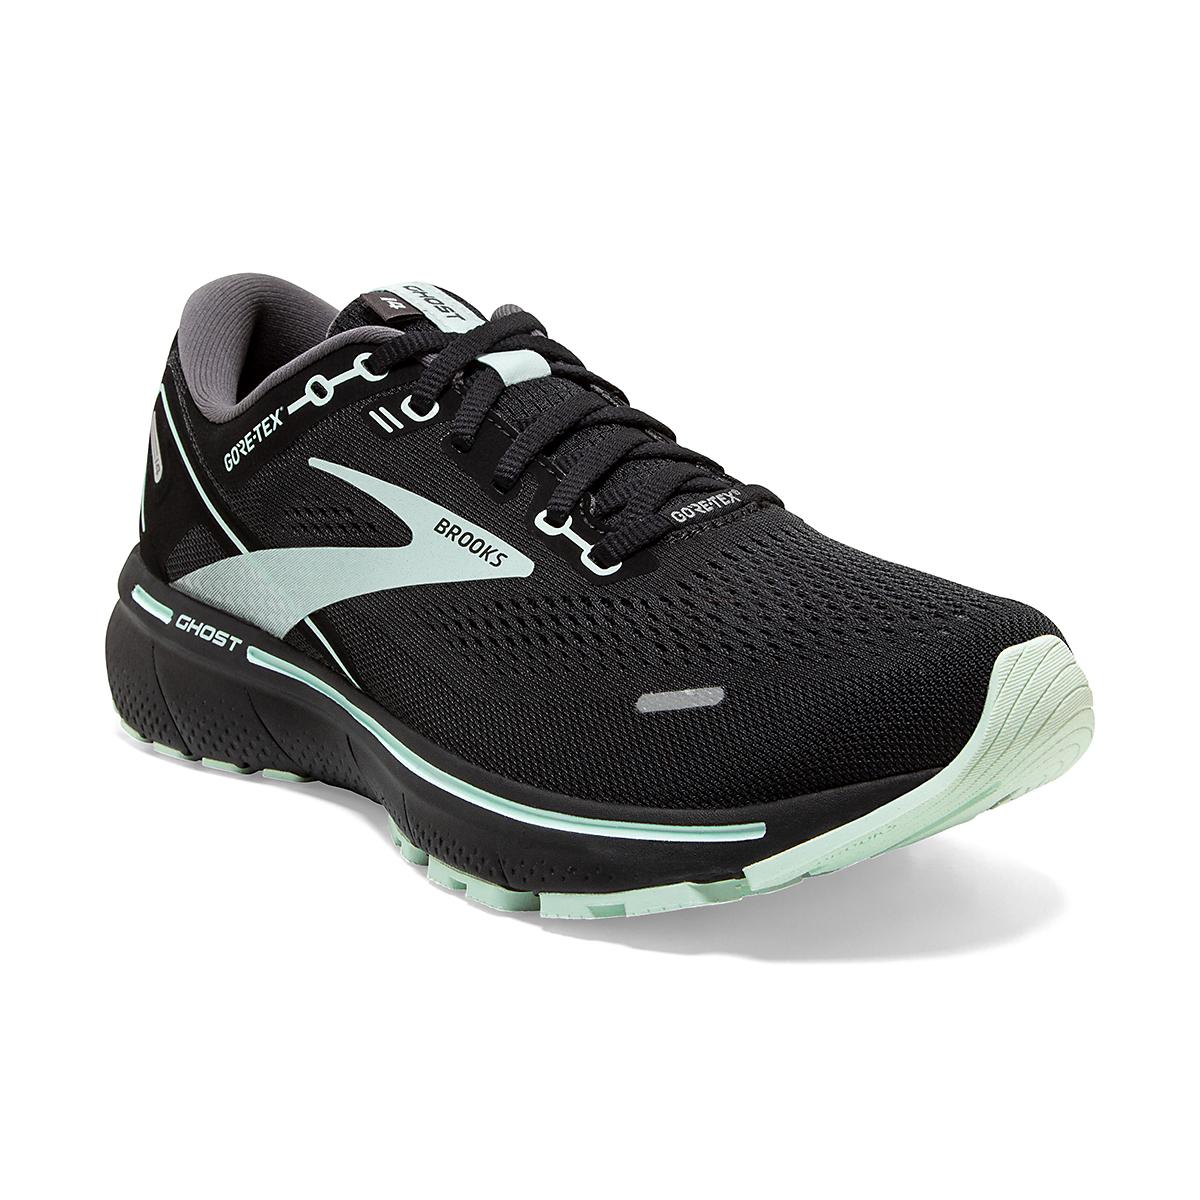 Women's Brooks Ghost 14 Gore-Tex Running Shoe - Color: Black/Blackened Pearl/Aquaglass - Size: 5 - Width: Regular, Black/Blackened Pearl/Aquaglass, large, image 5